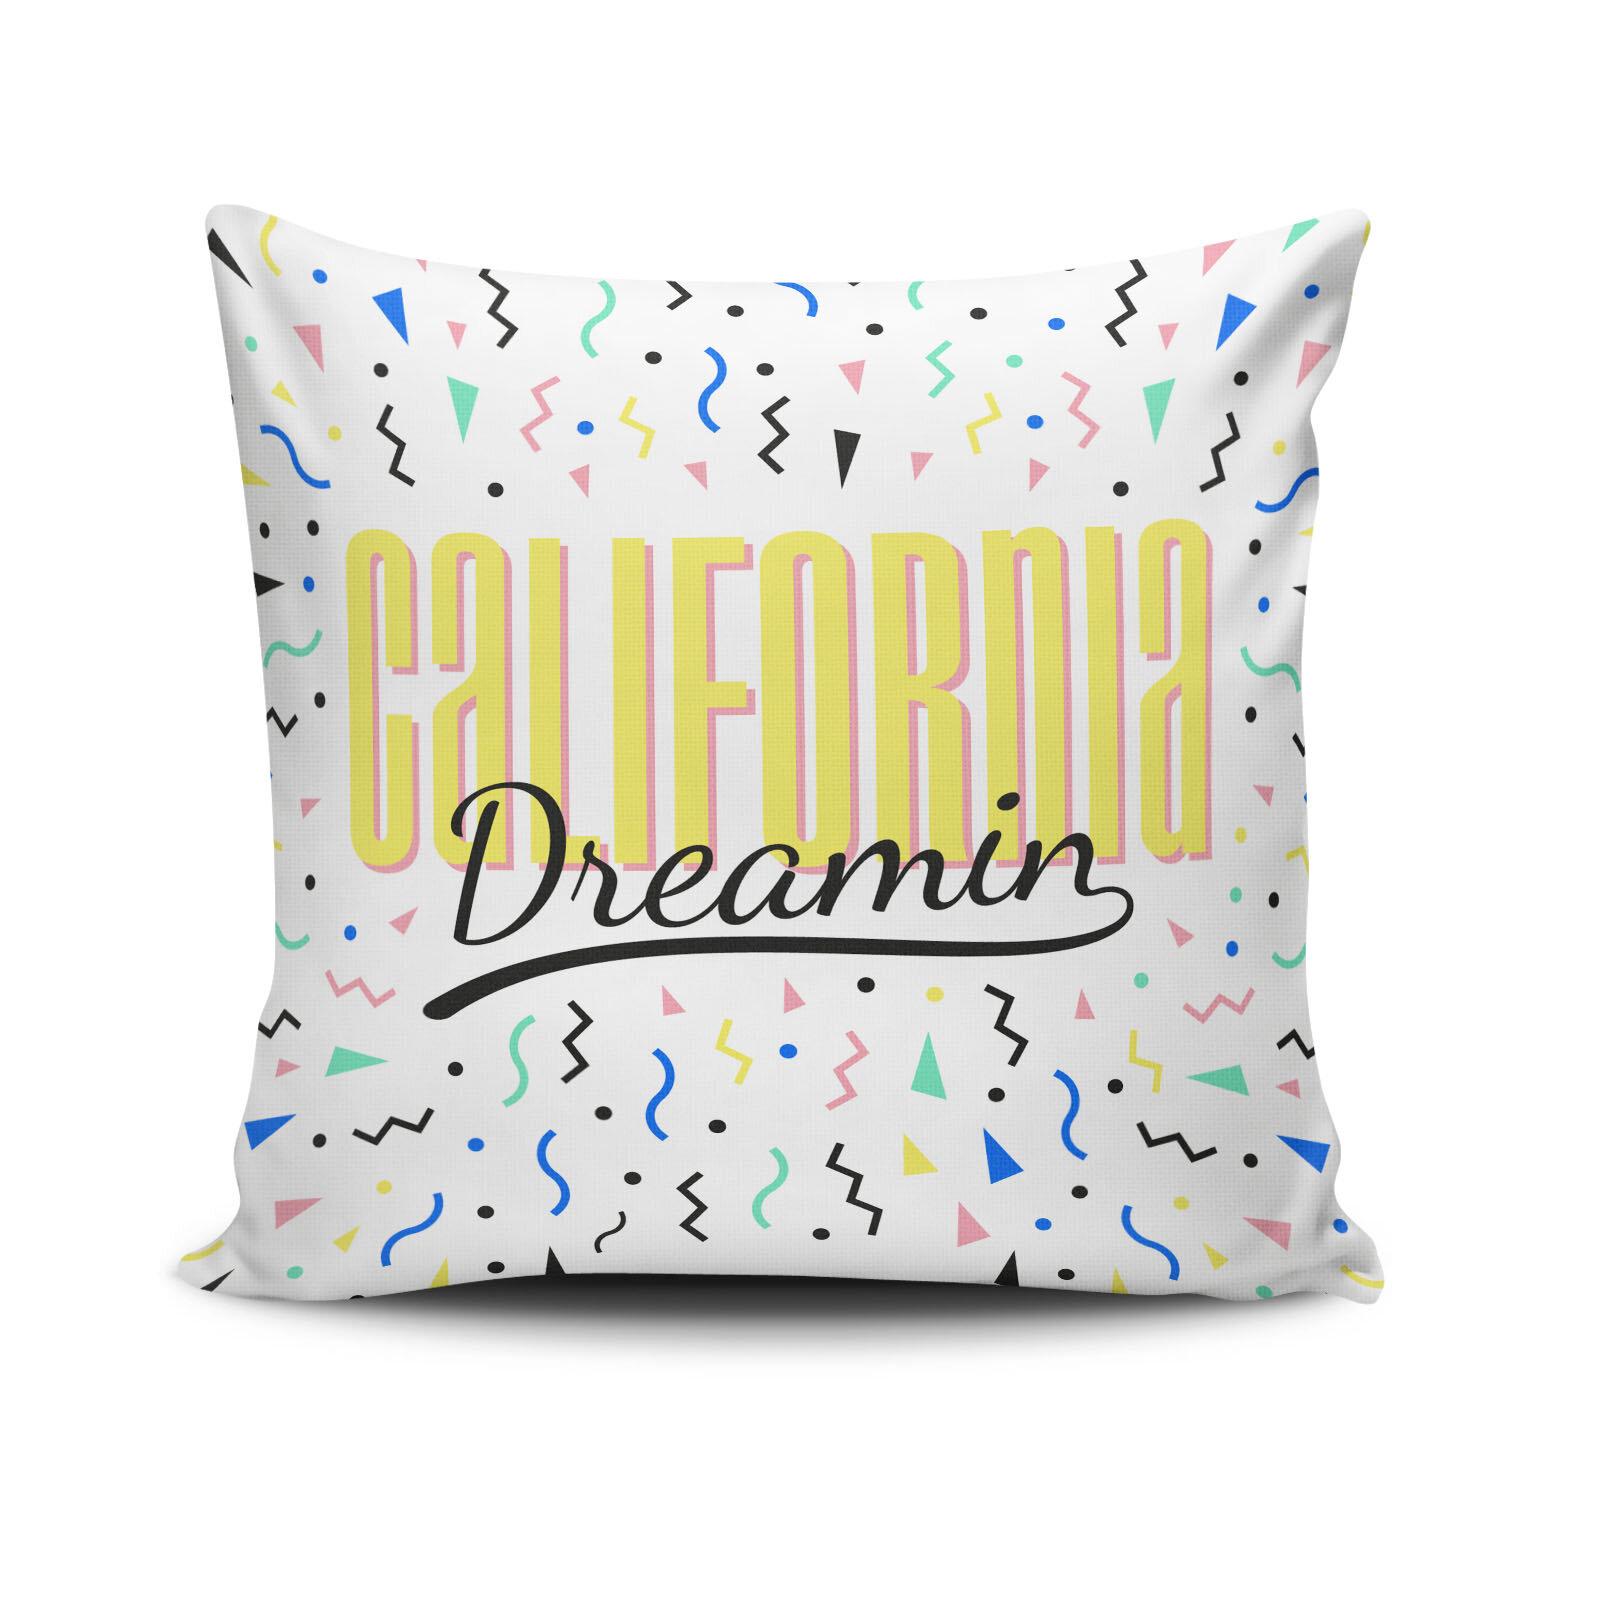 Perna decorativa Cushion Love, Dimensiune: 45 x 45 cm, Material exterior: 50% bumbac / 50% poliester 768CLV0215